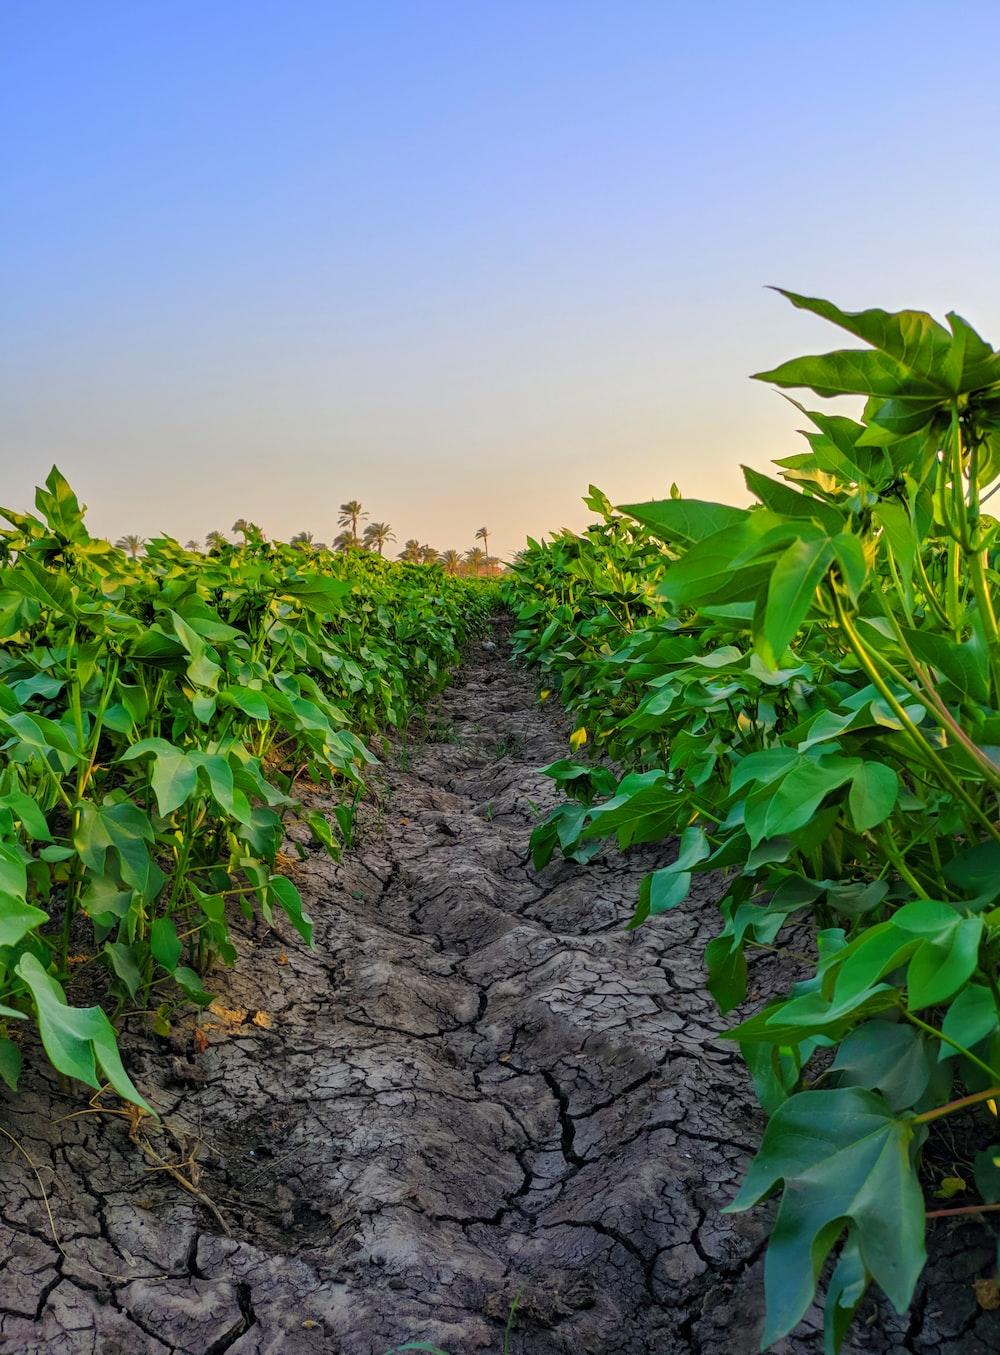 dried soil between plants